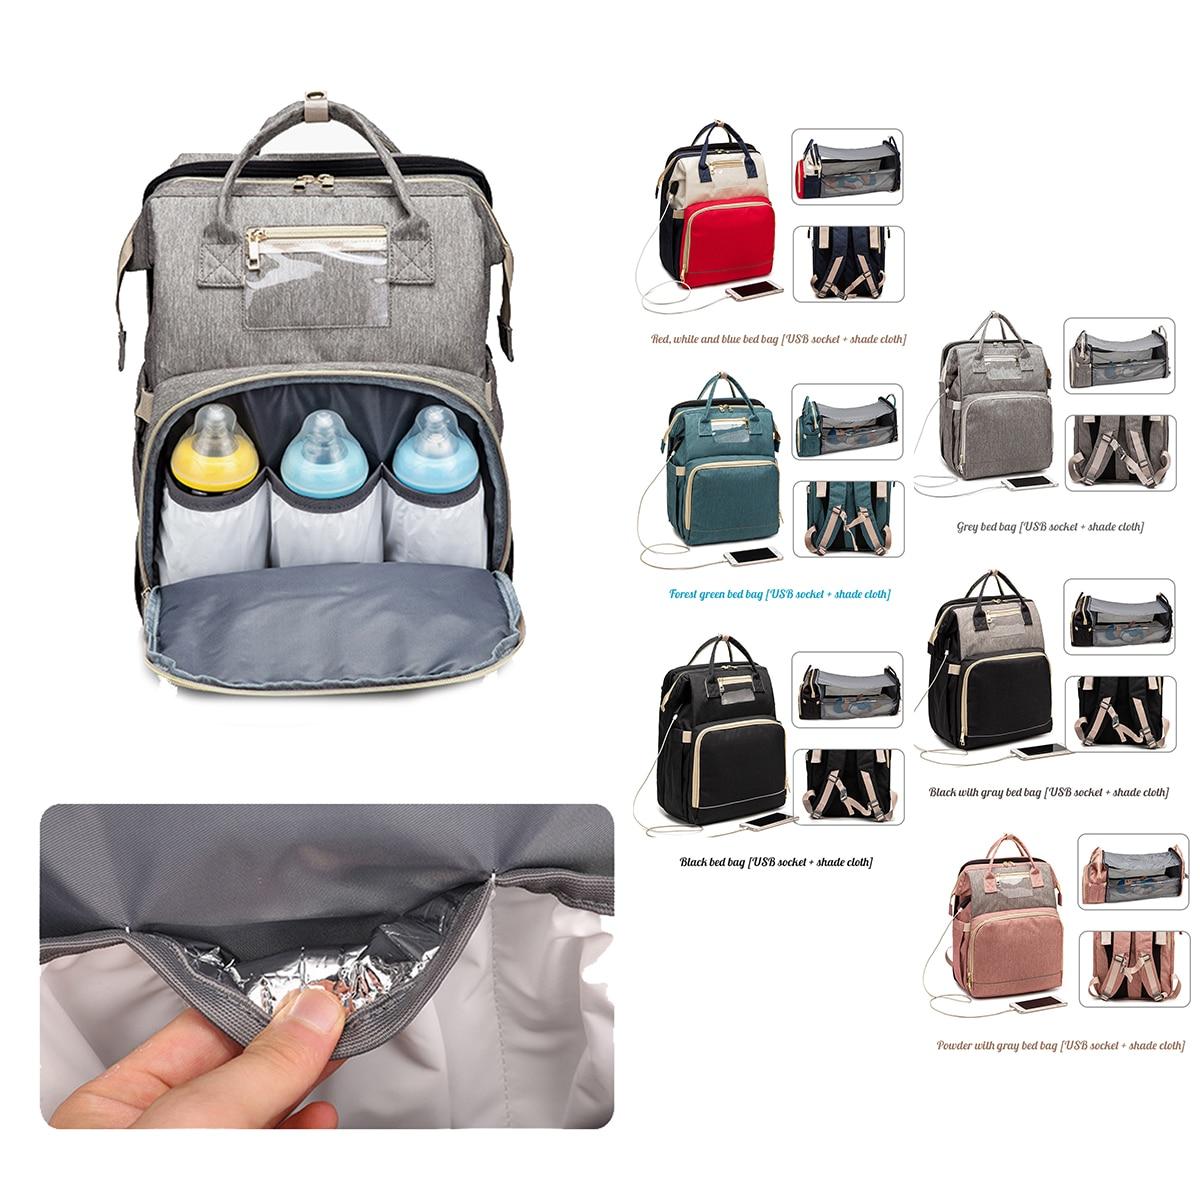 2021 Fashion Mummy Maternity Nappy Bag Large Capacity Nappy Bag Travel Backpack Nursing Bag for Baby Care Women's Fashion Bag